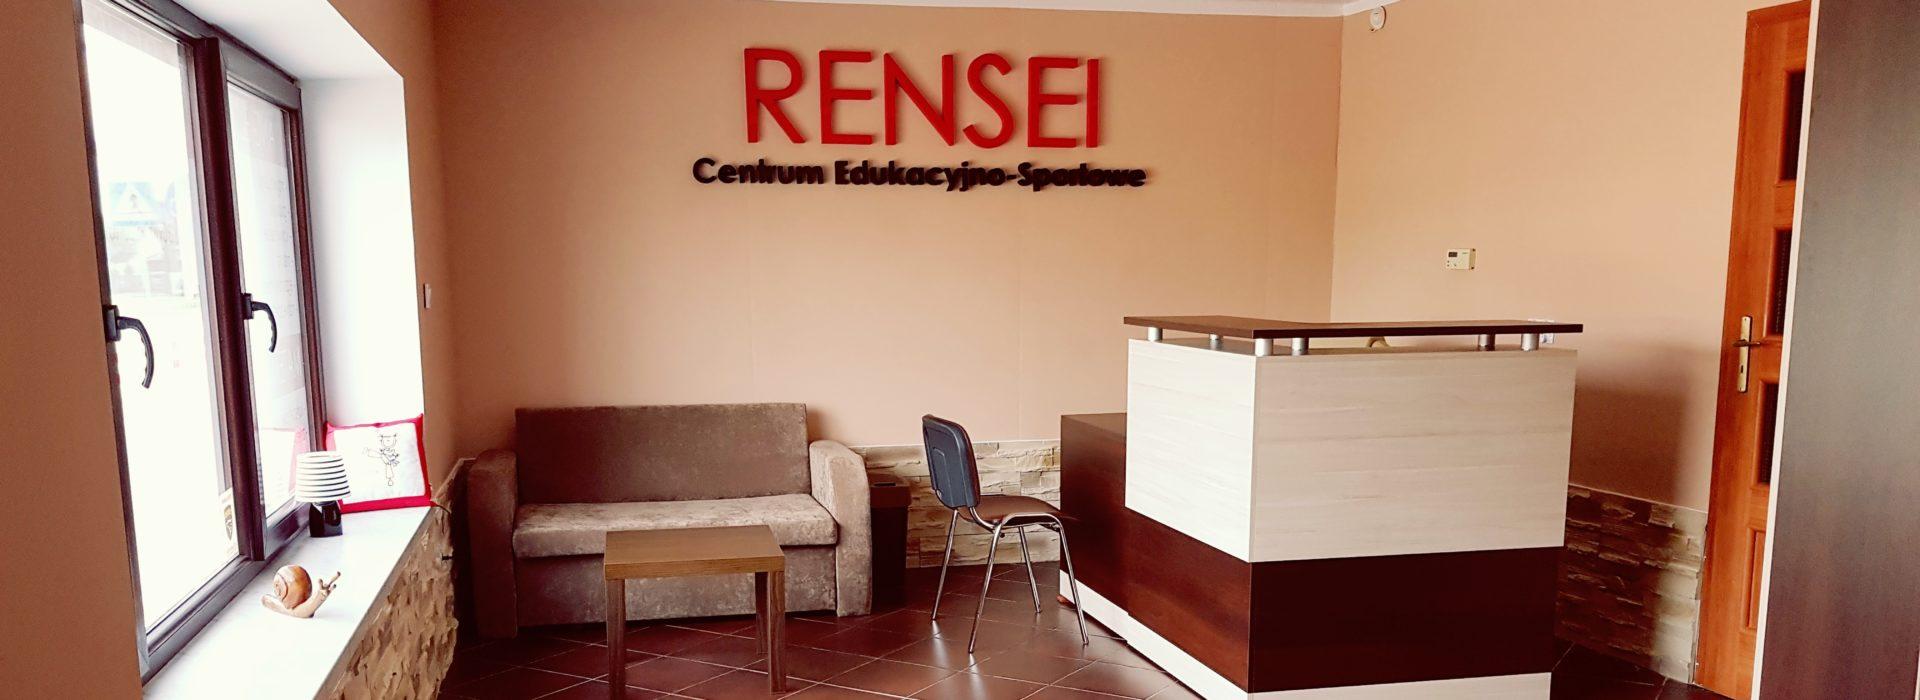 Rensei